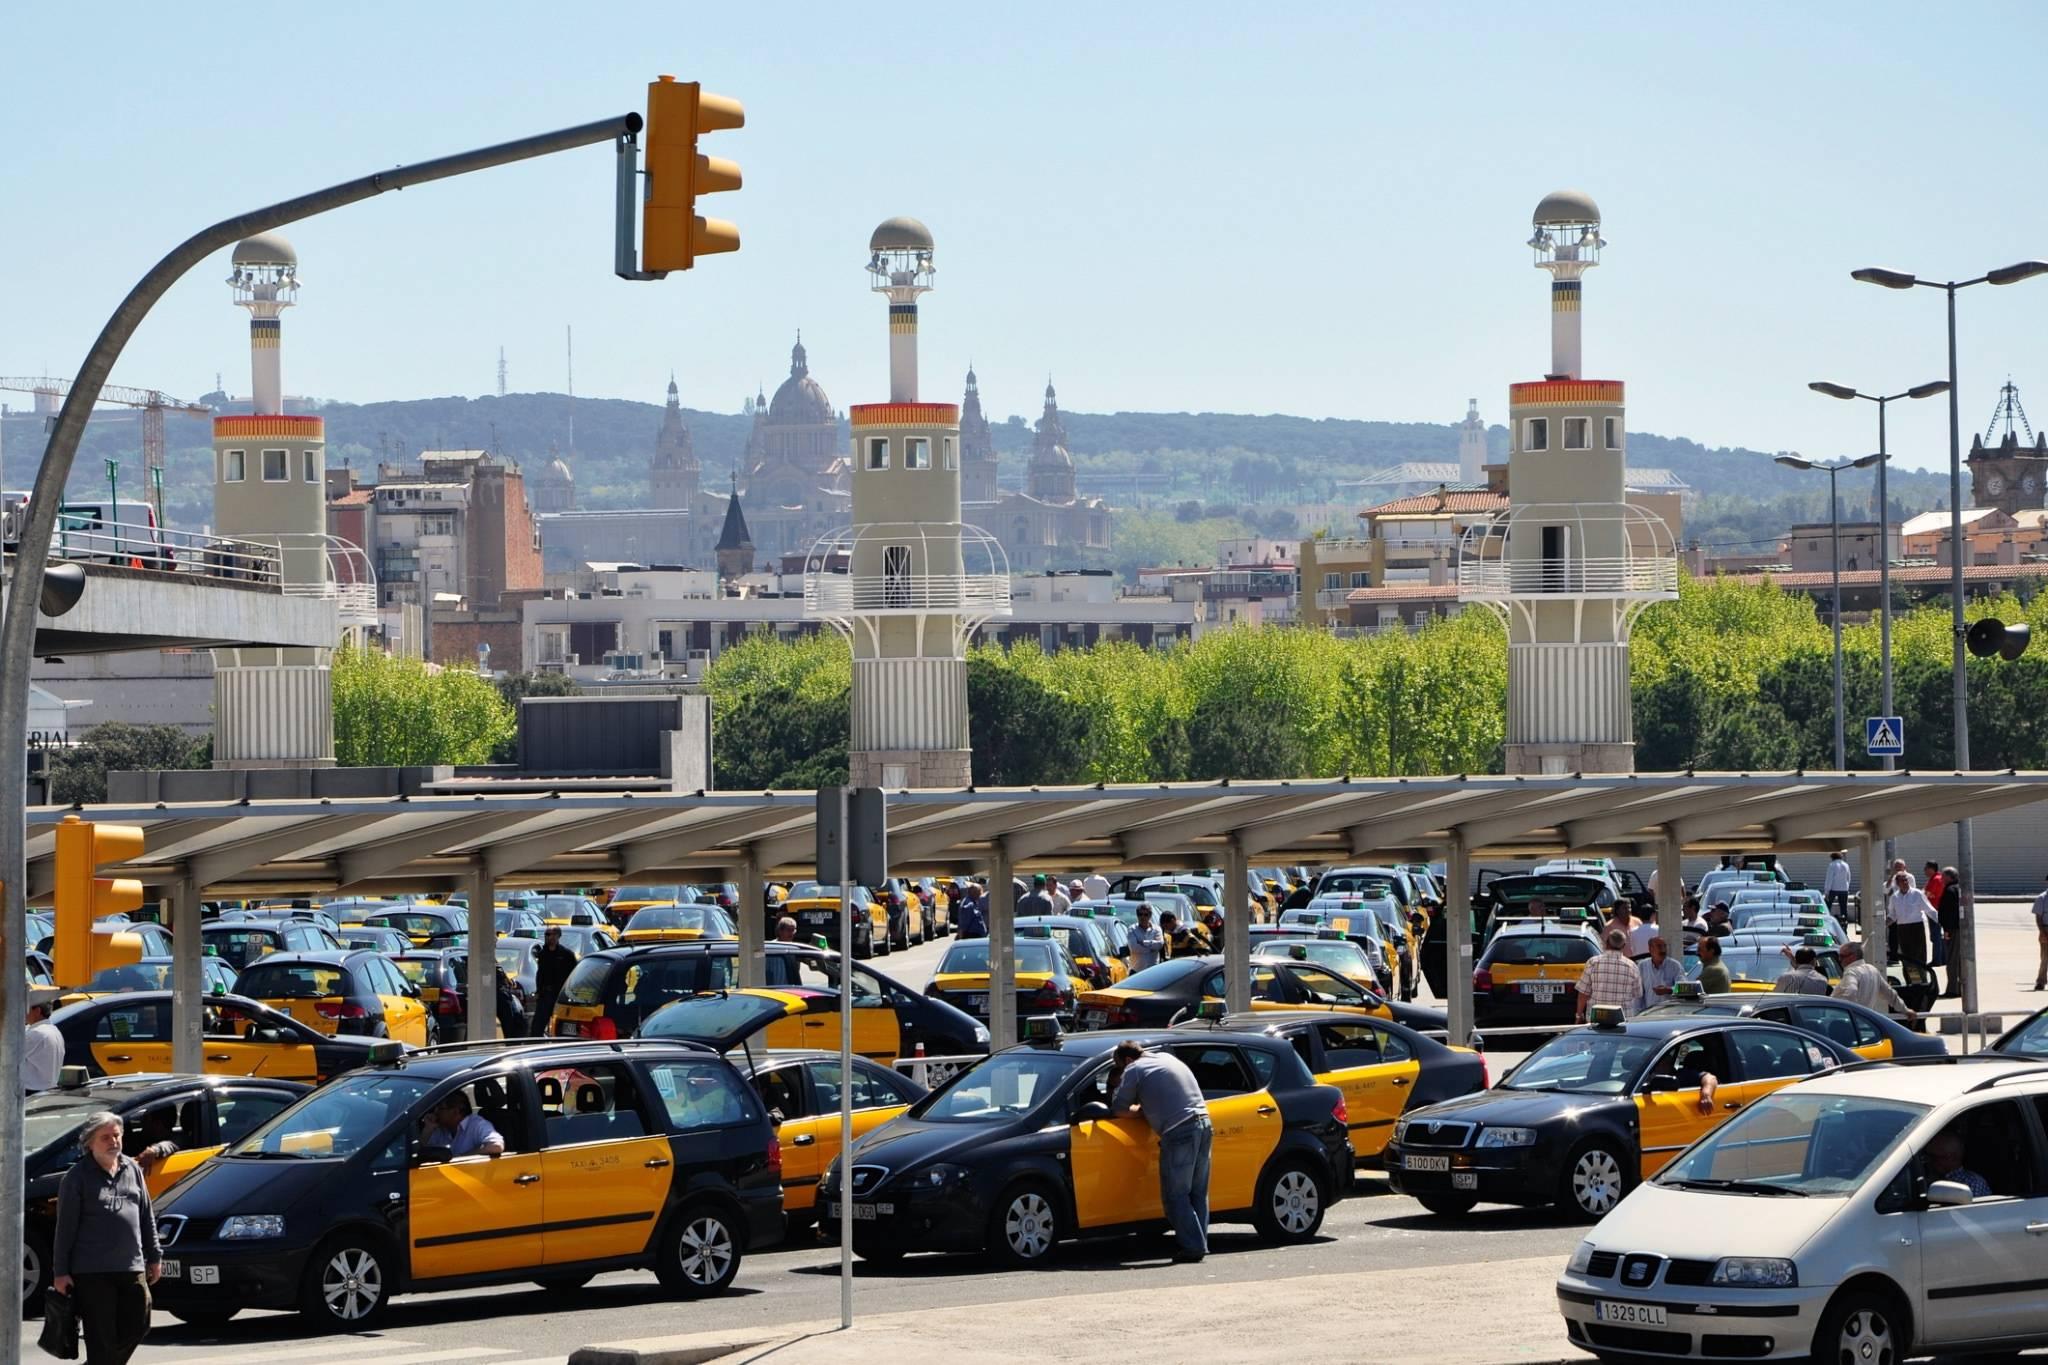 Транспорт в испании - всё для туриста